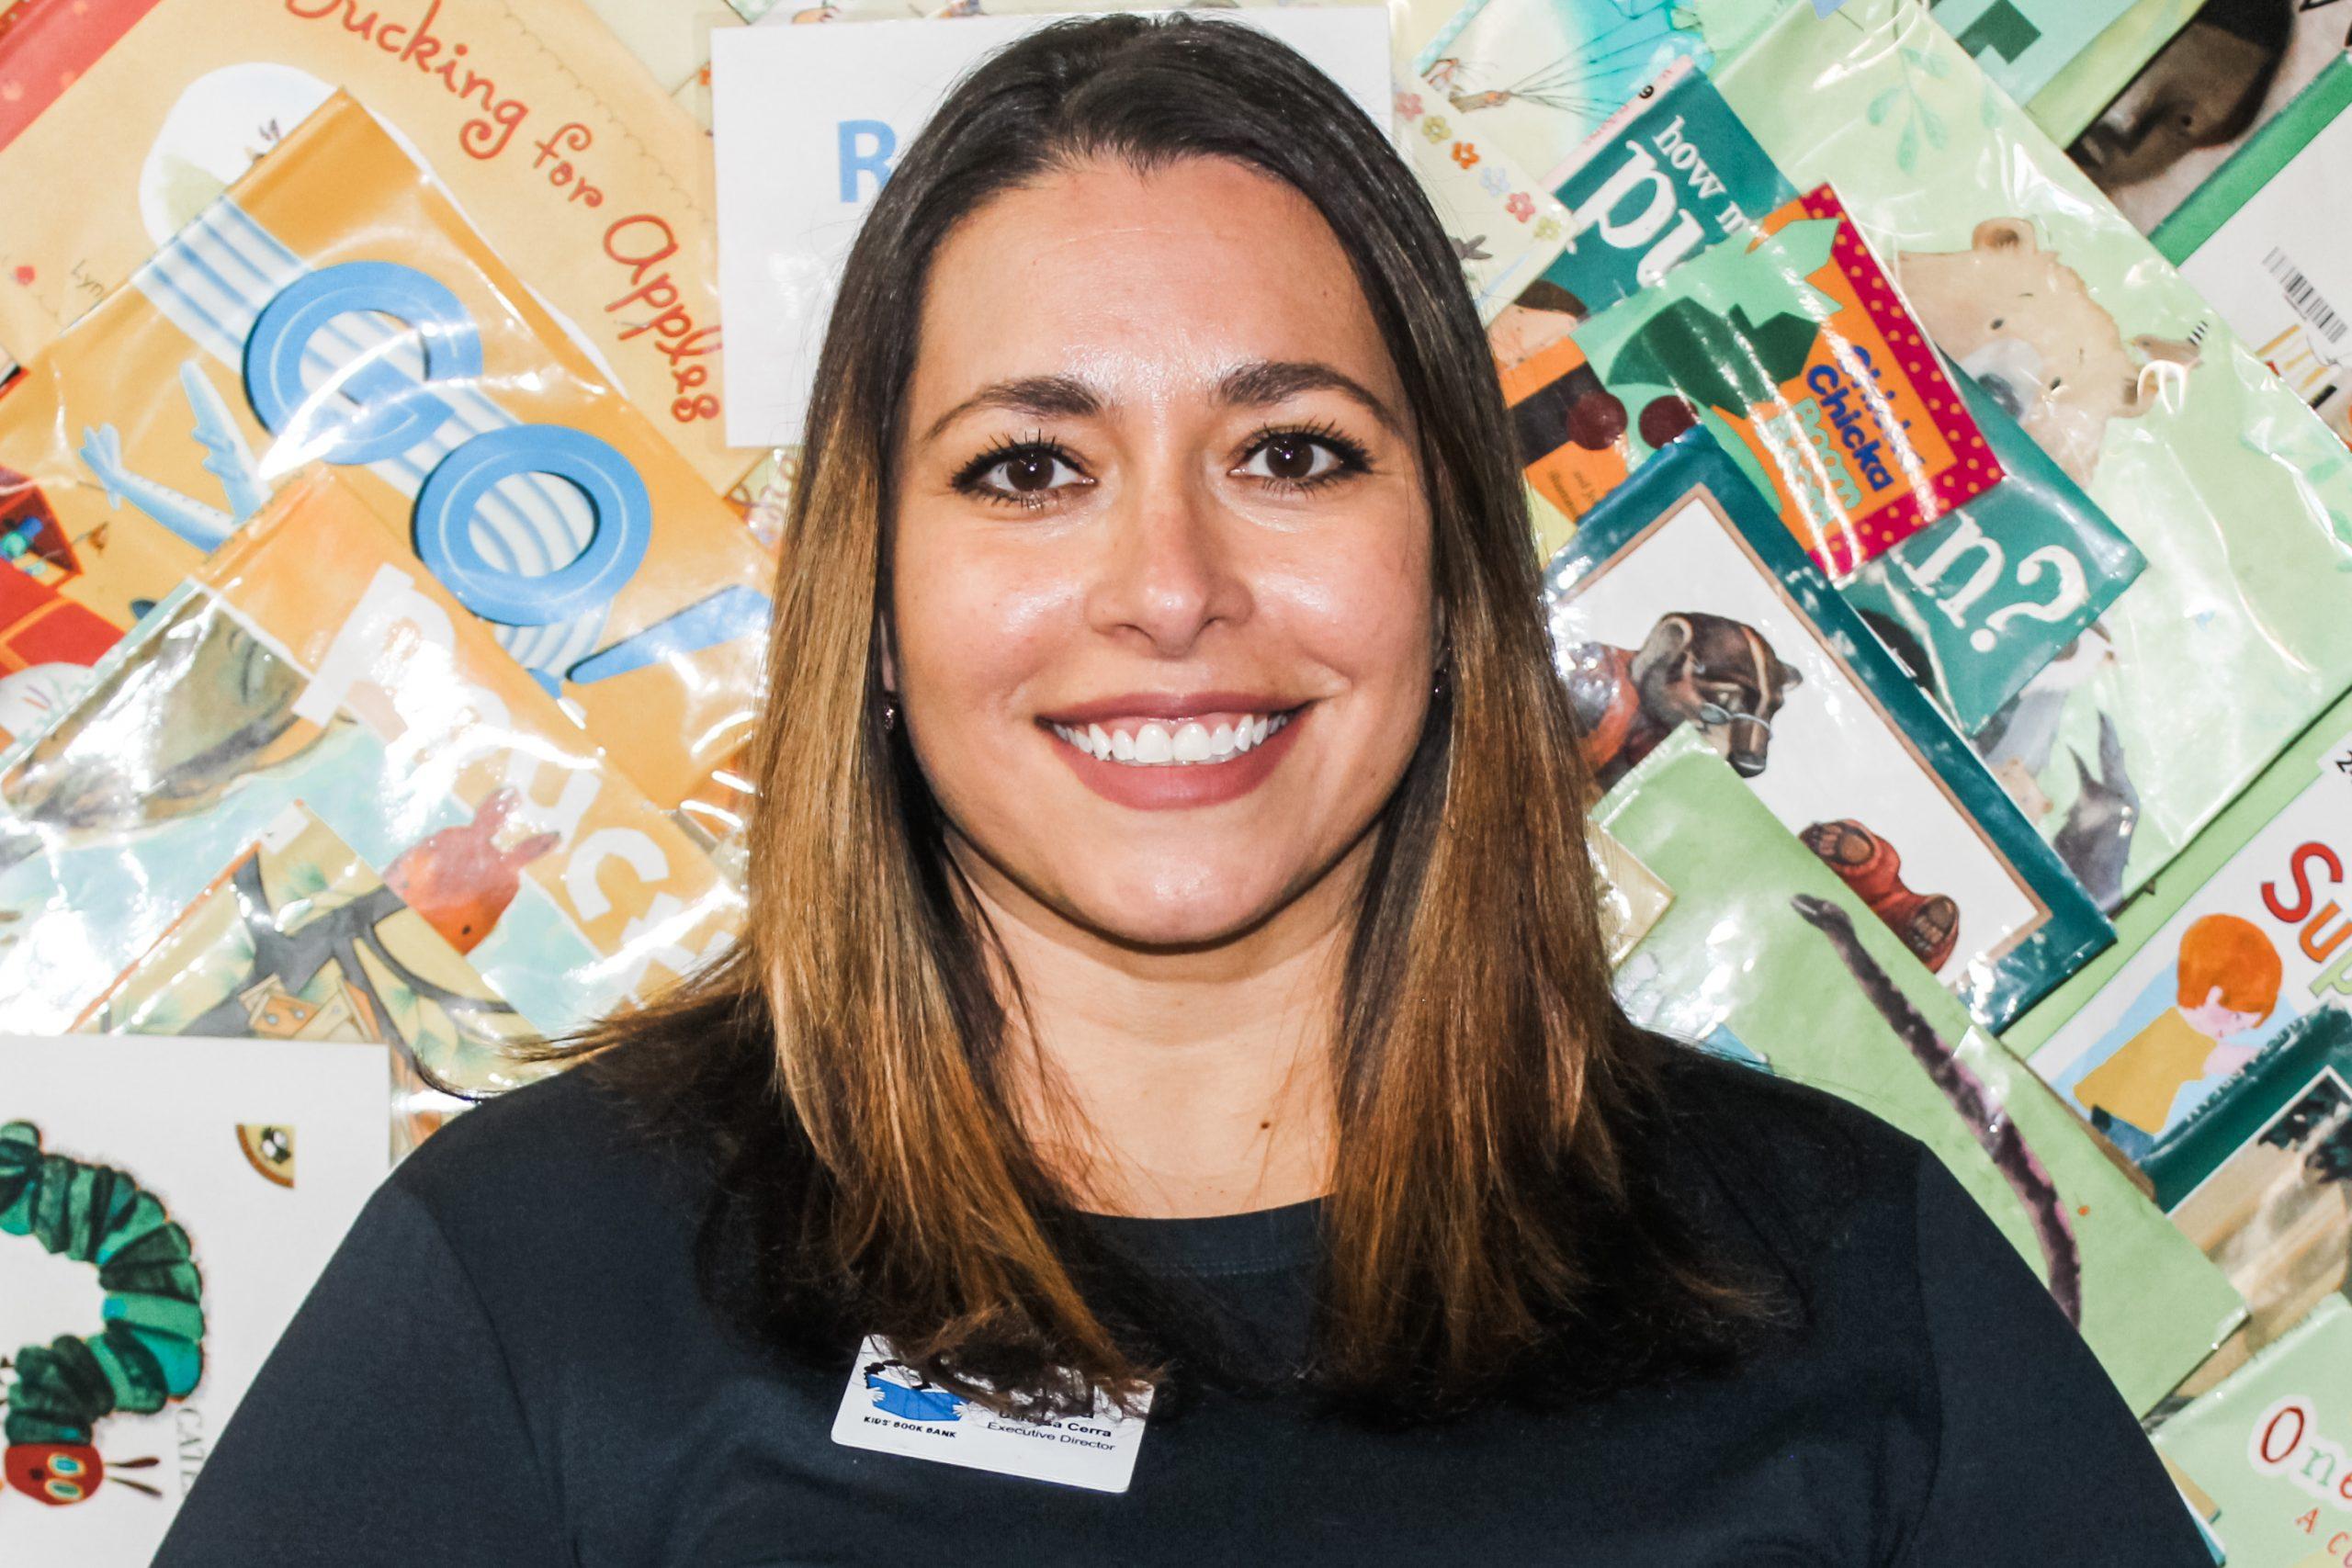 Cleveland Kids' Book Bank Executive Director Thea DeRosa Cerra